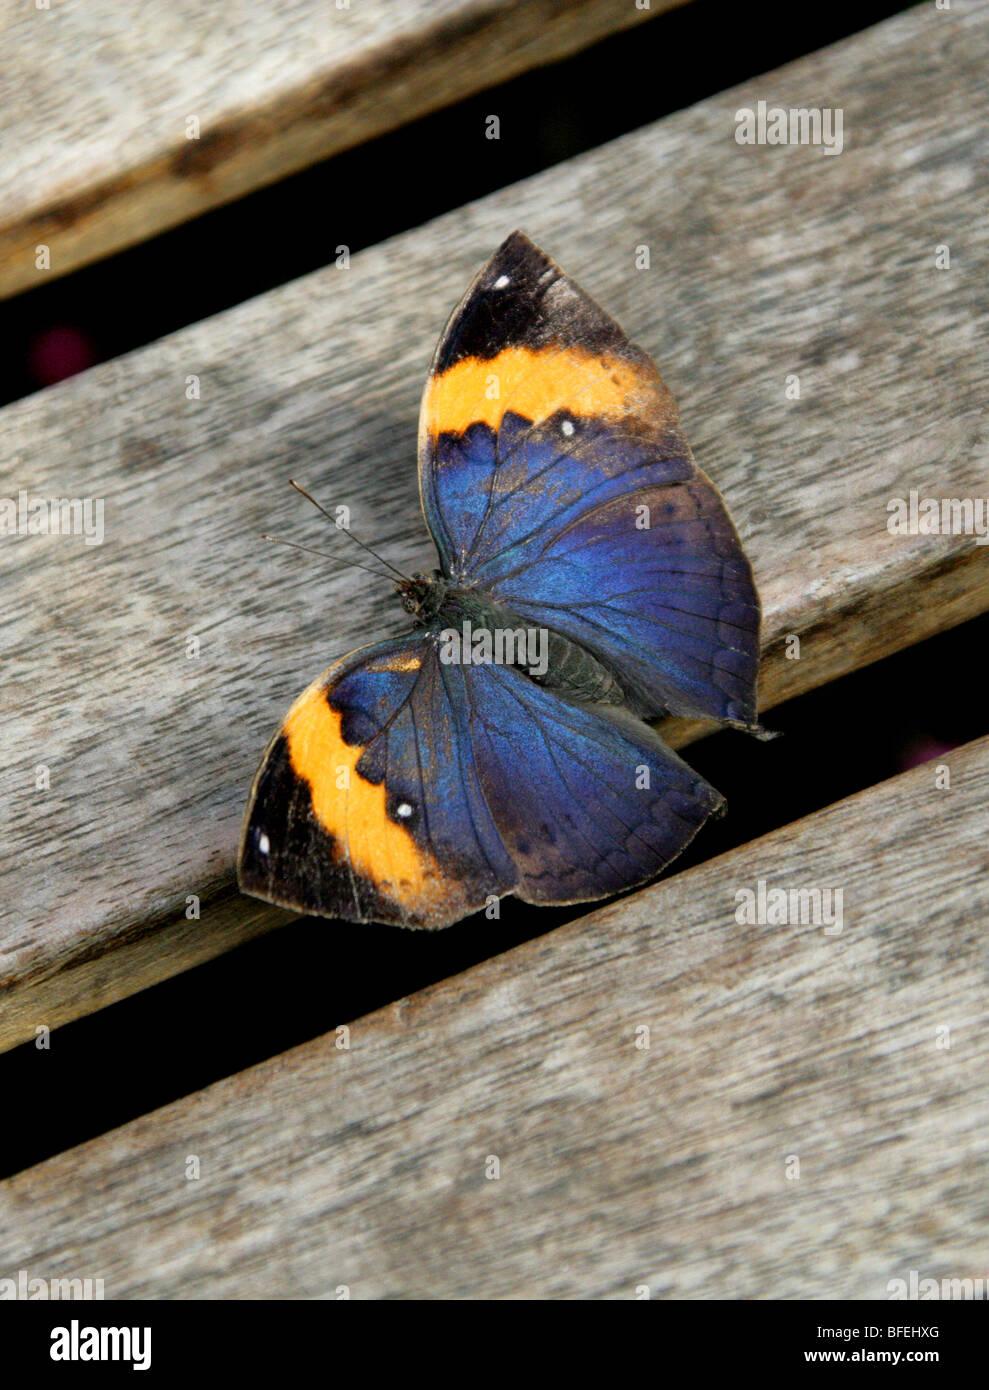 Foglia indiano Butterfly, Kallima inachus, Nymphalidae (femmina). Immagini Stock